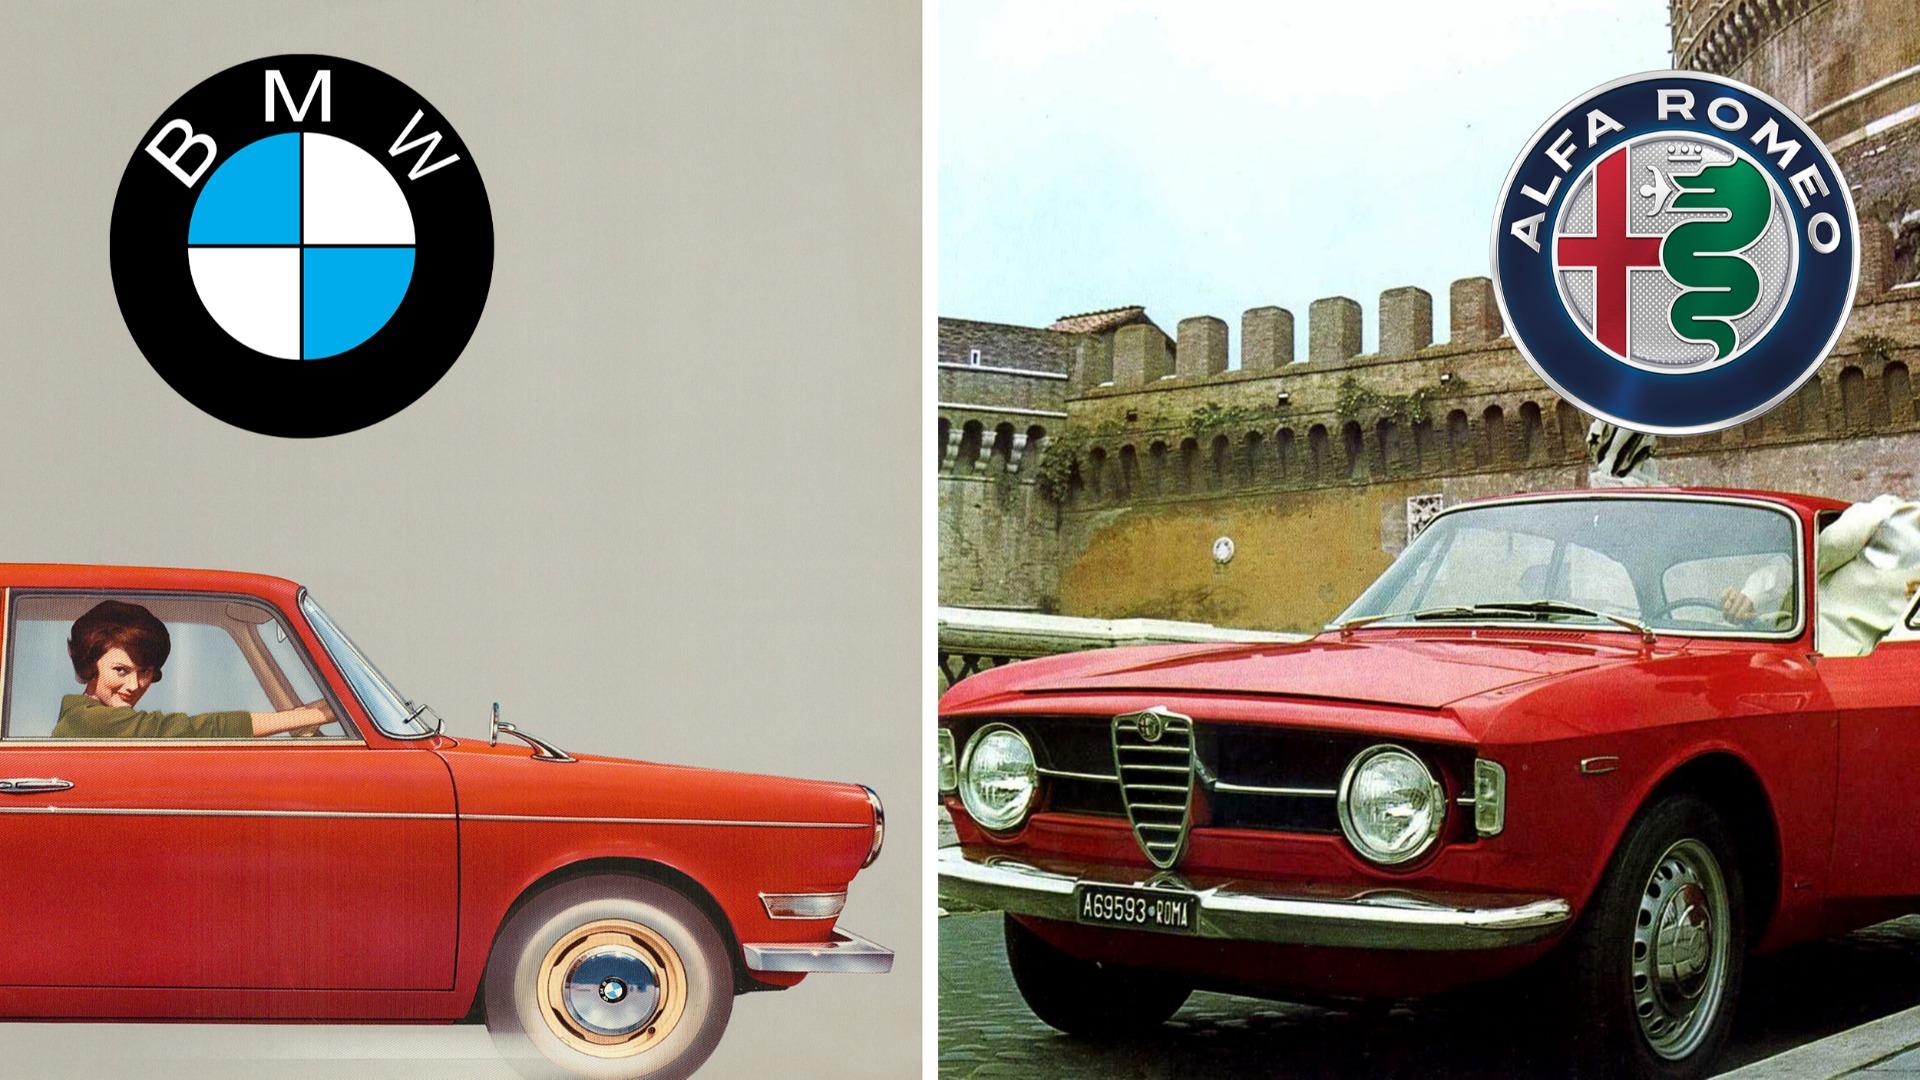 Lordens Garasje - BMW vs Alfa Romeo